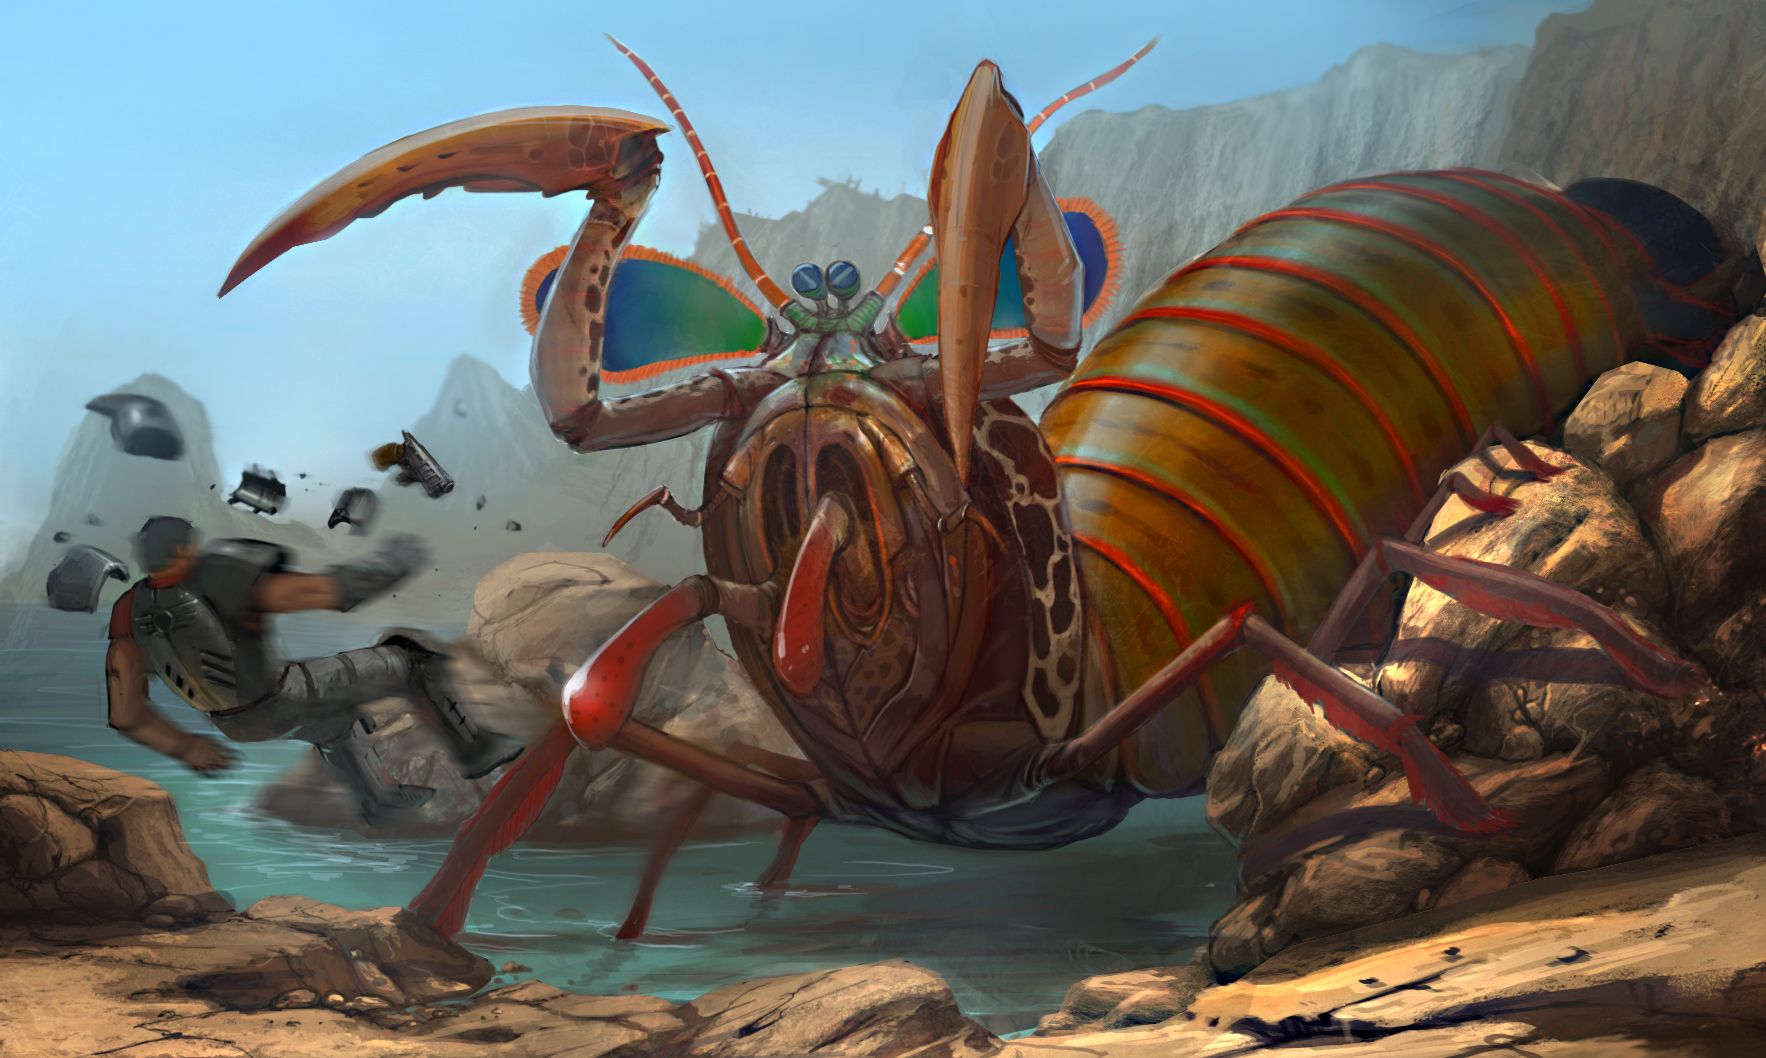 Mutant mantis shrimp | Fallout Wiki | FANDOM powered by Wikia